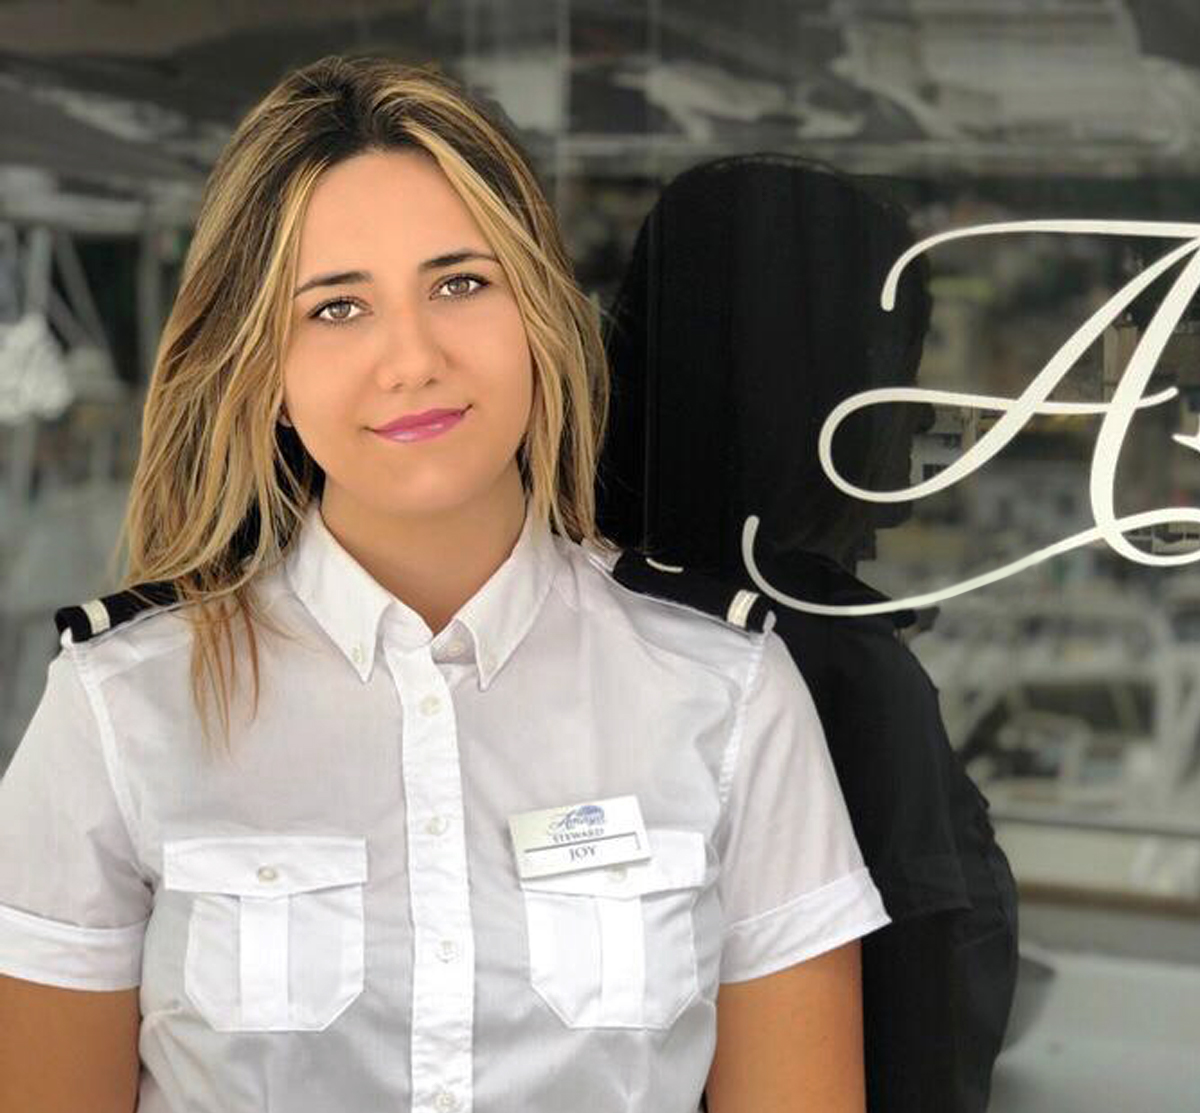 https://www.amayayacht.com/wp-content/uploads/2019/06/Xhoina.jpg